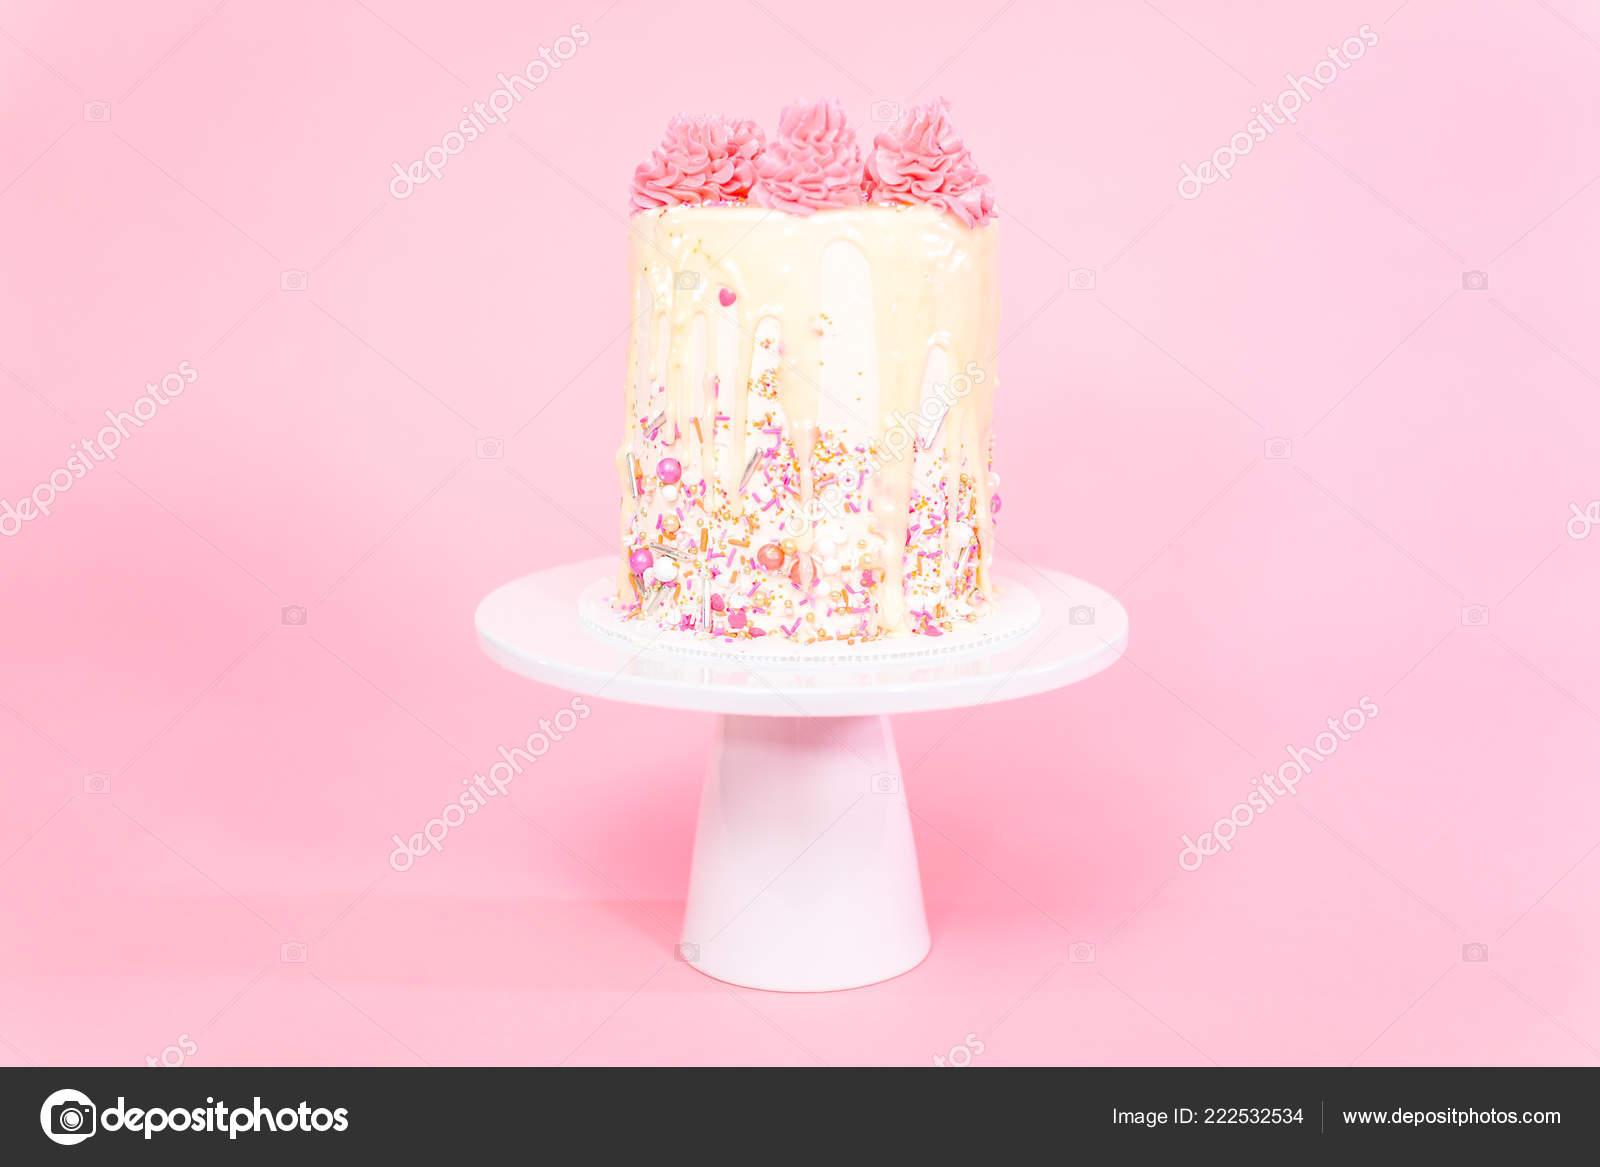 Pink White Buttercream Cream Cake Pink Sprinkles White Chocolate